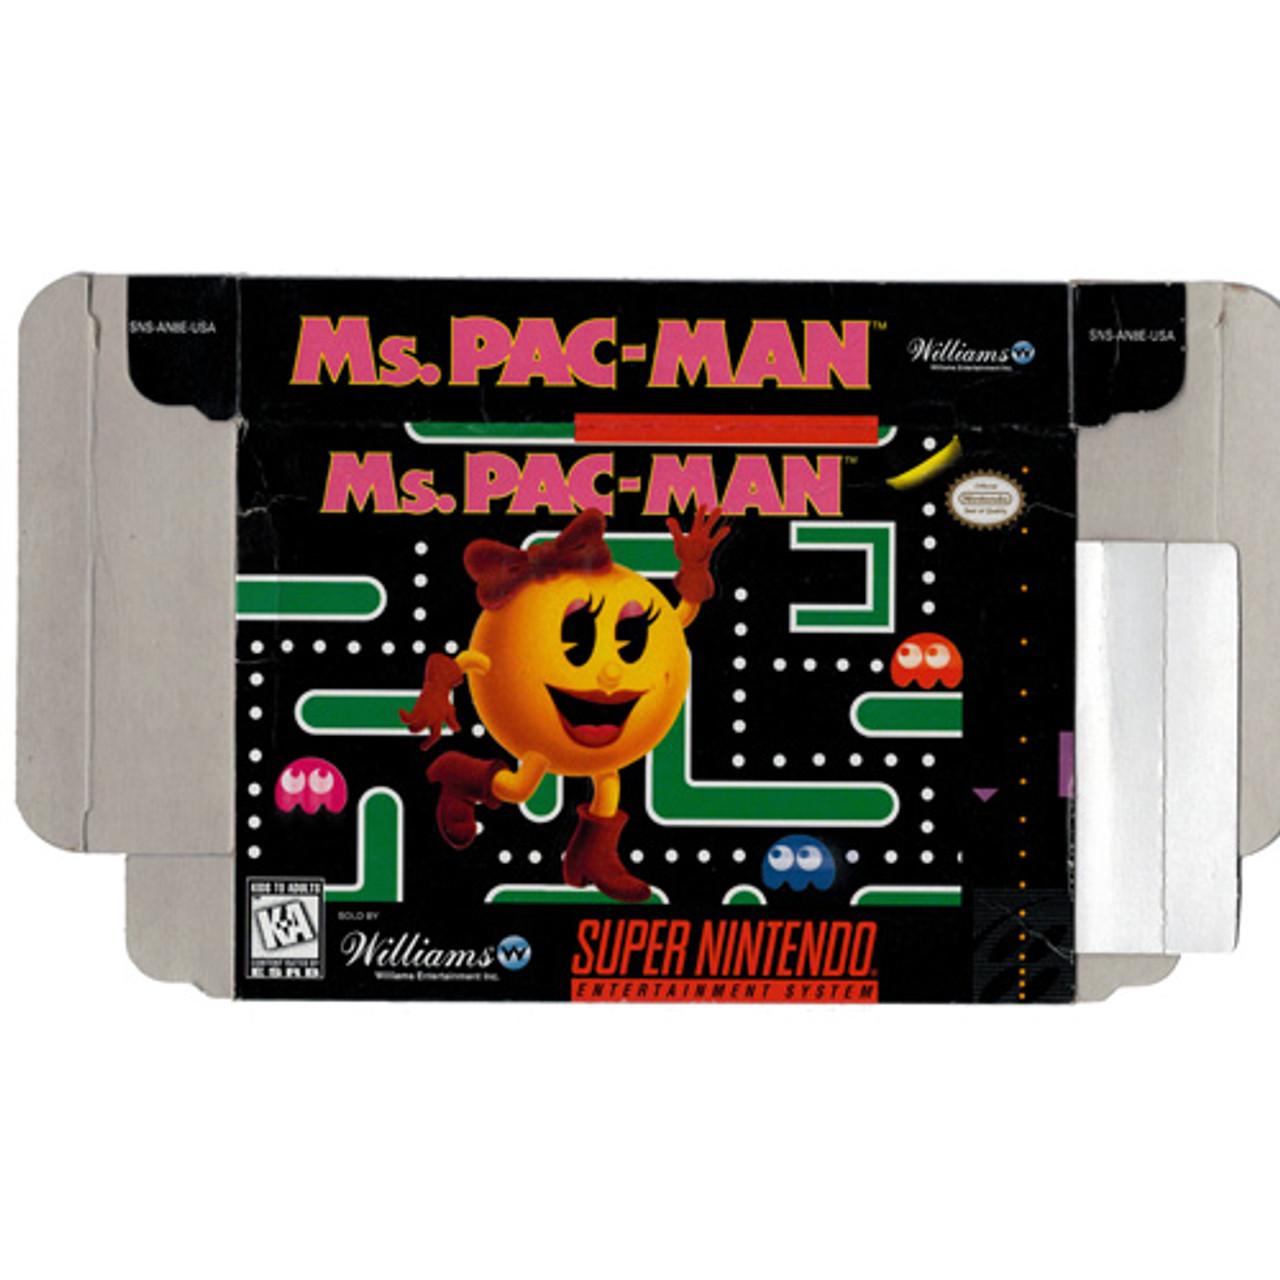 Ms Pacman Super Nintendo Snes Box For Sale Dkoldies